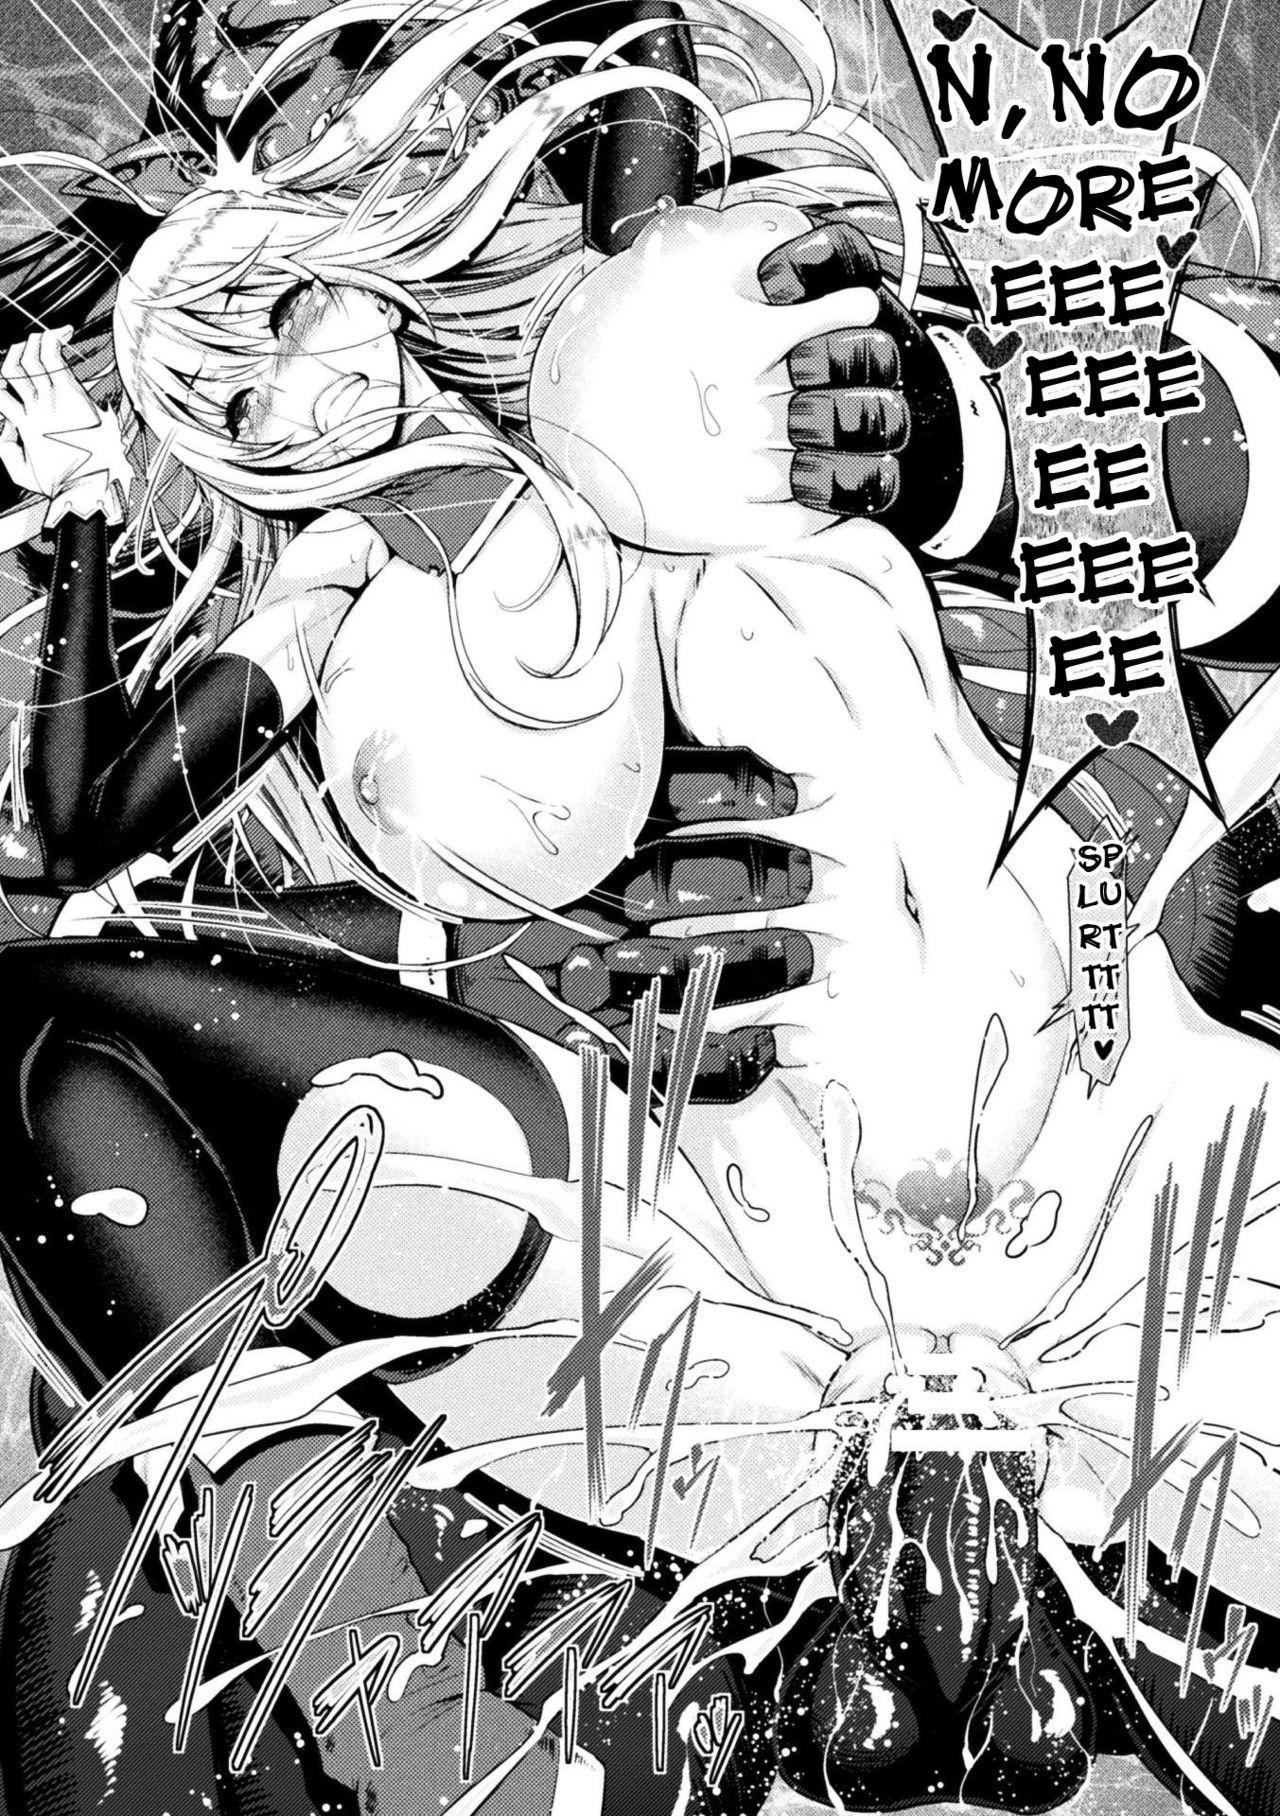 [Yamada Gogogo] Erona ~Orc no Inmon ni Okasareta Onna Kishi no Matsuro~ | Erona ~The Fall of a Beautiful Knight Cursed with the Lewd Mark of an Orc~ Ch. 1-5 [English] {darknight} 46